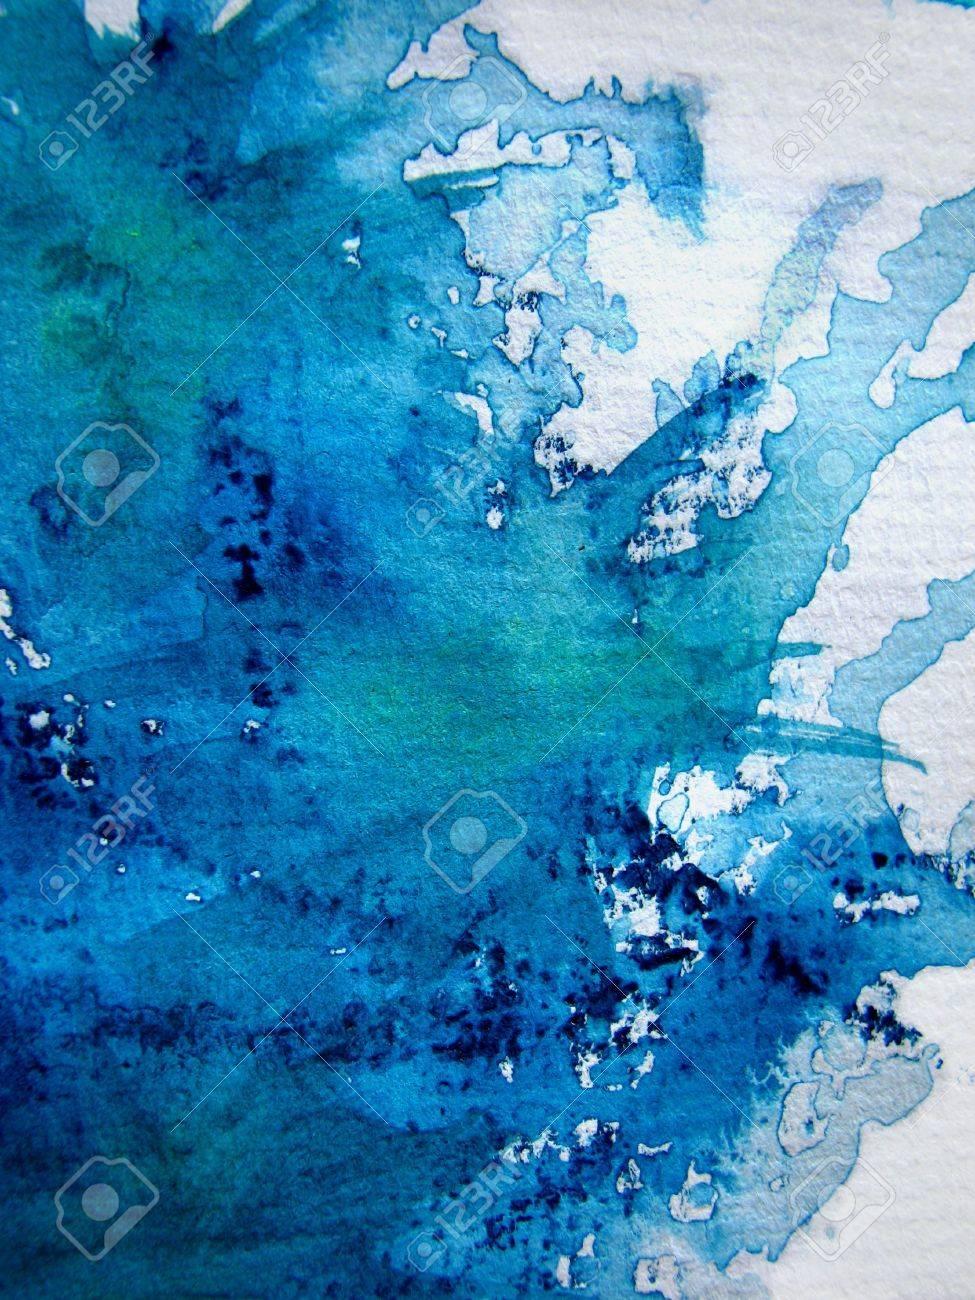 Splash of Blue Watercolor Stock Photo - 4932131